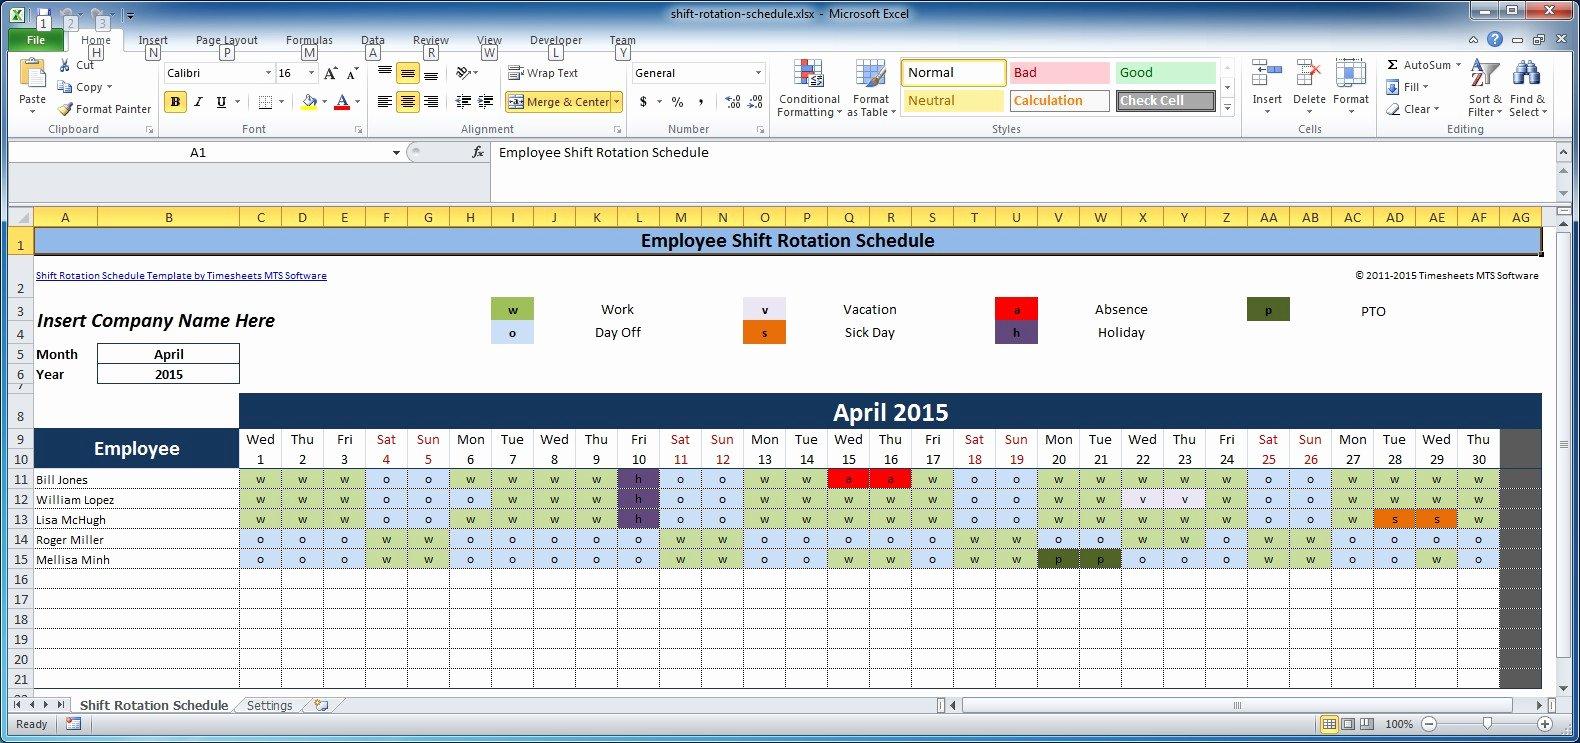 Work Shift Schedule Template Beautiful Free Employee and Shift Schedule Templates